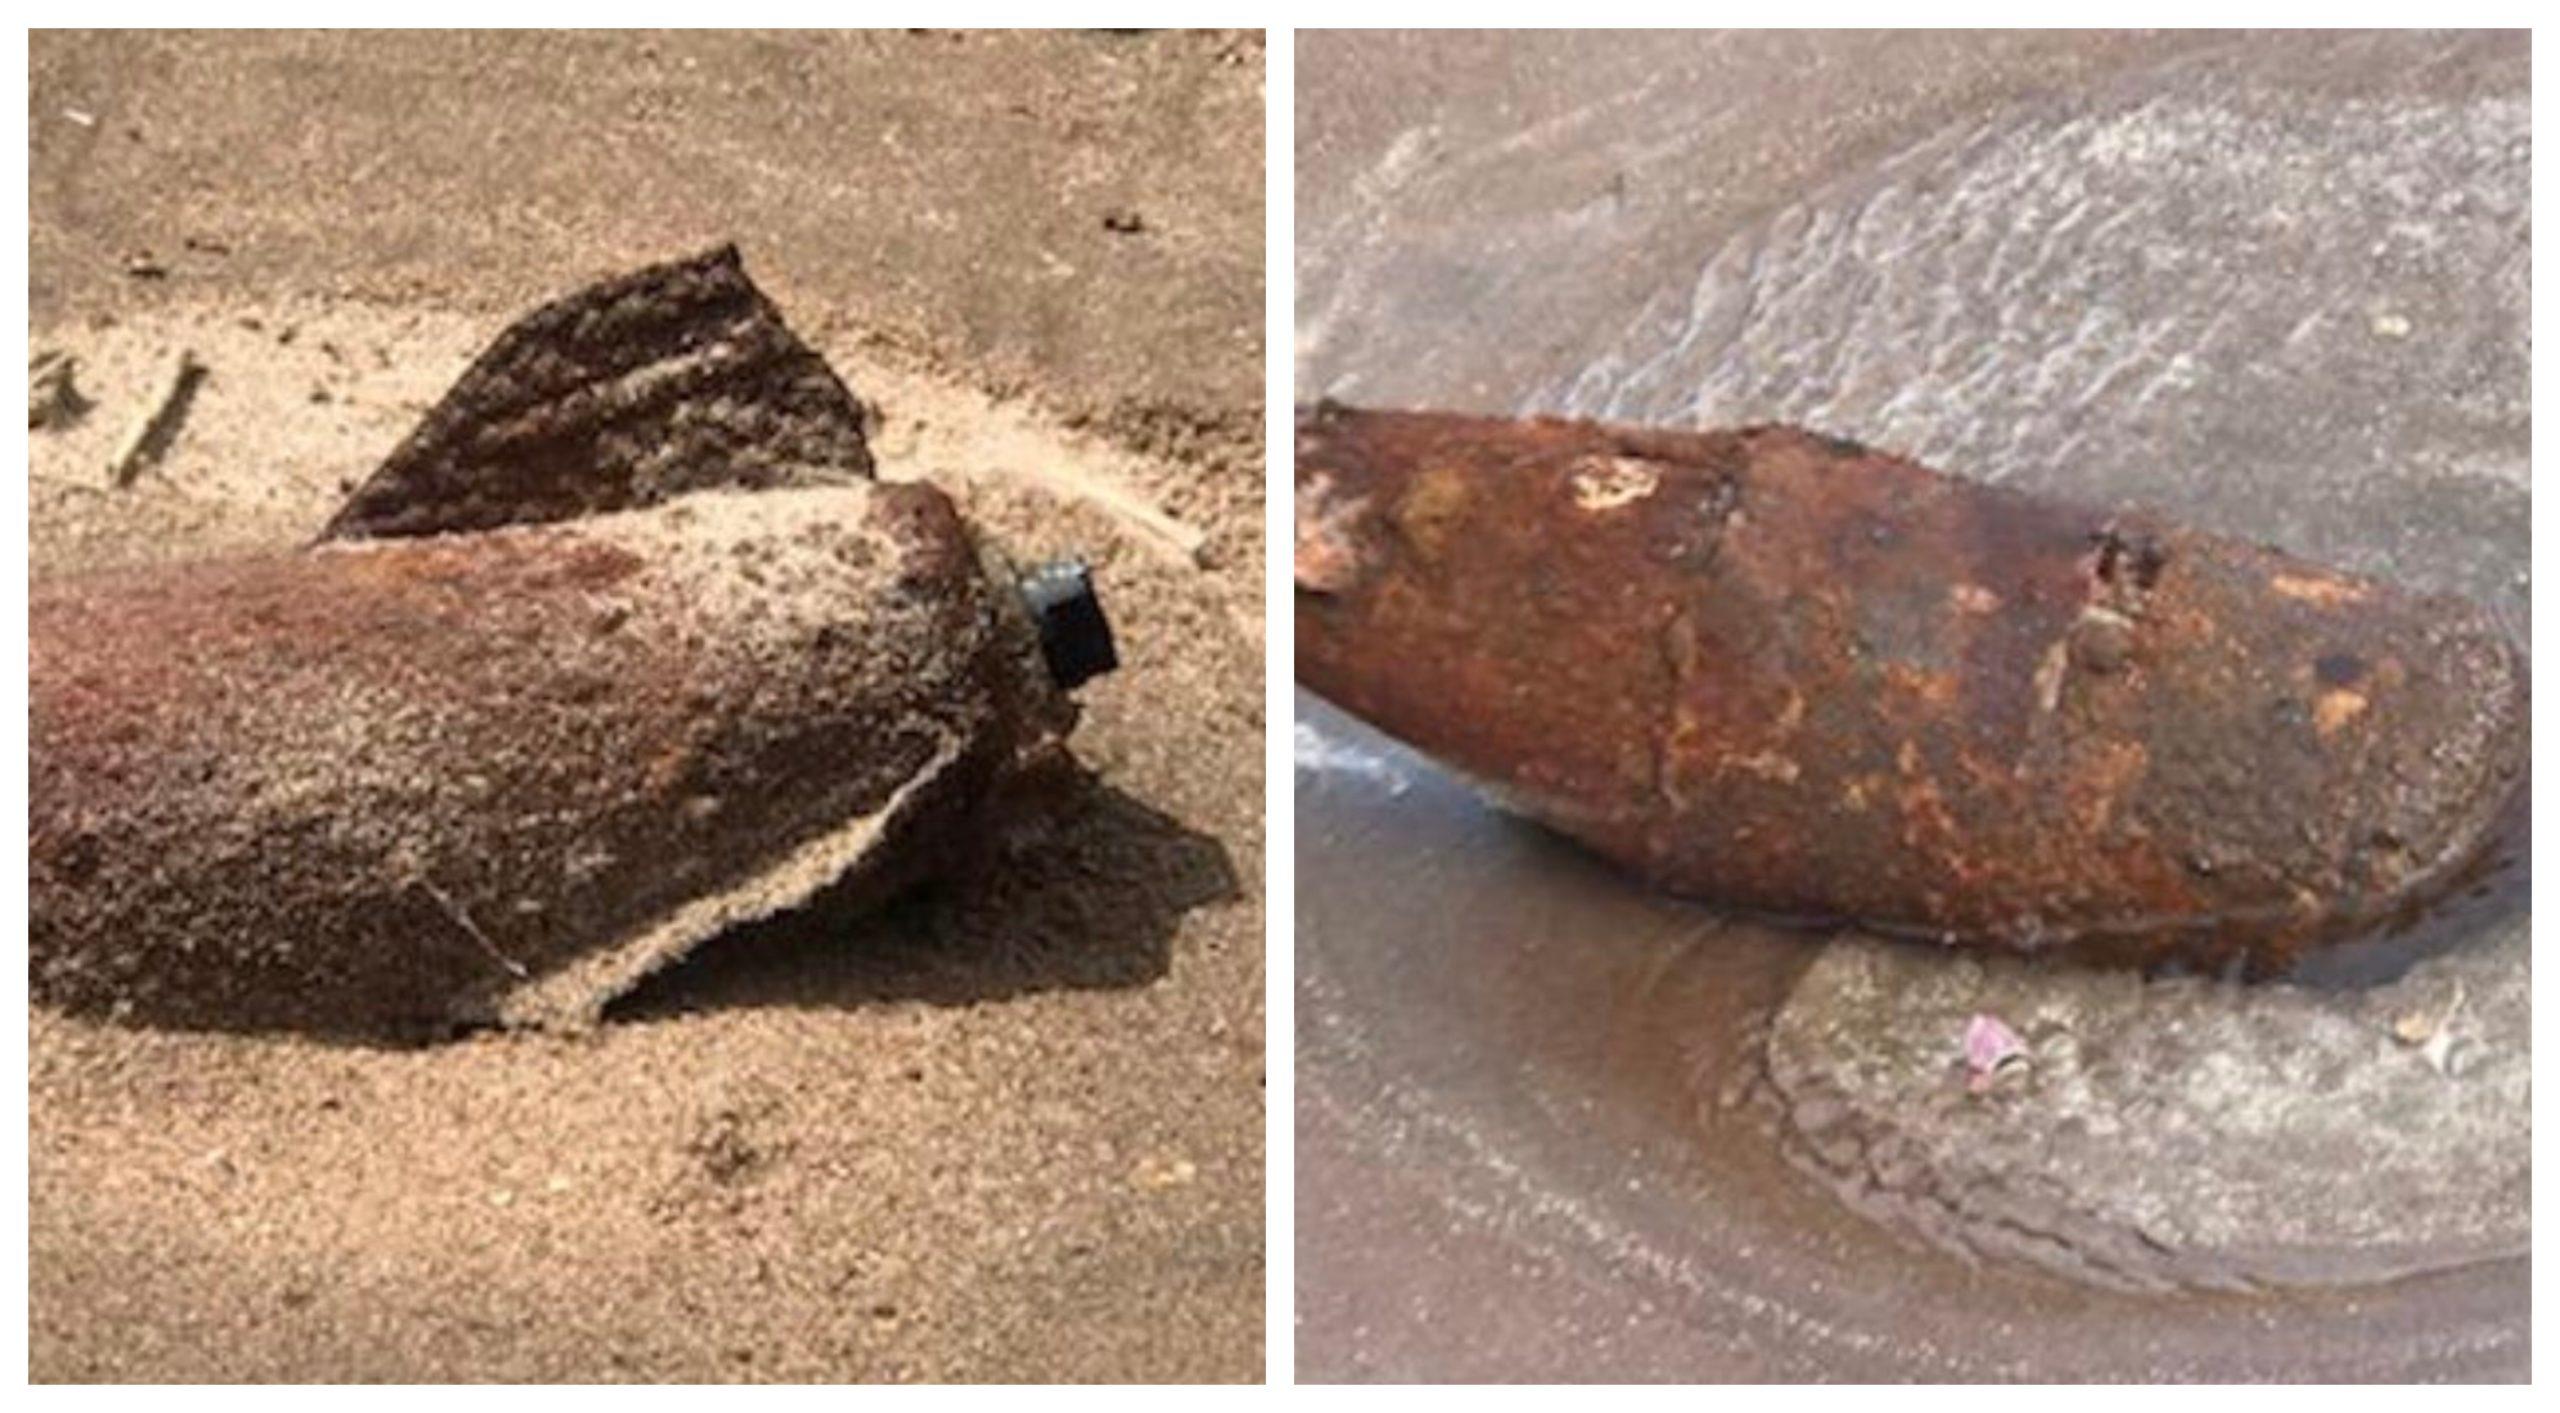 The bomb was found near Barry Buddon